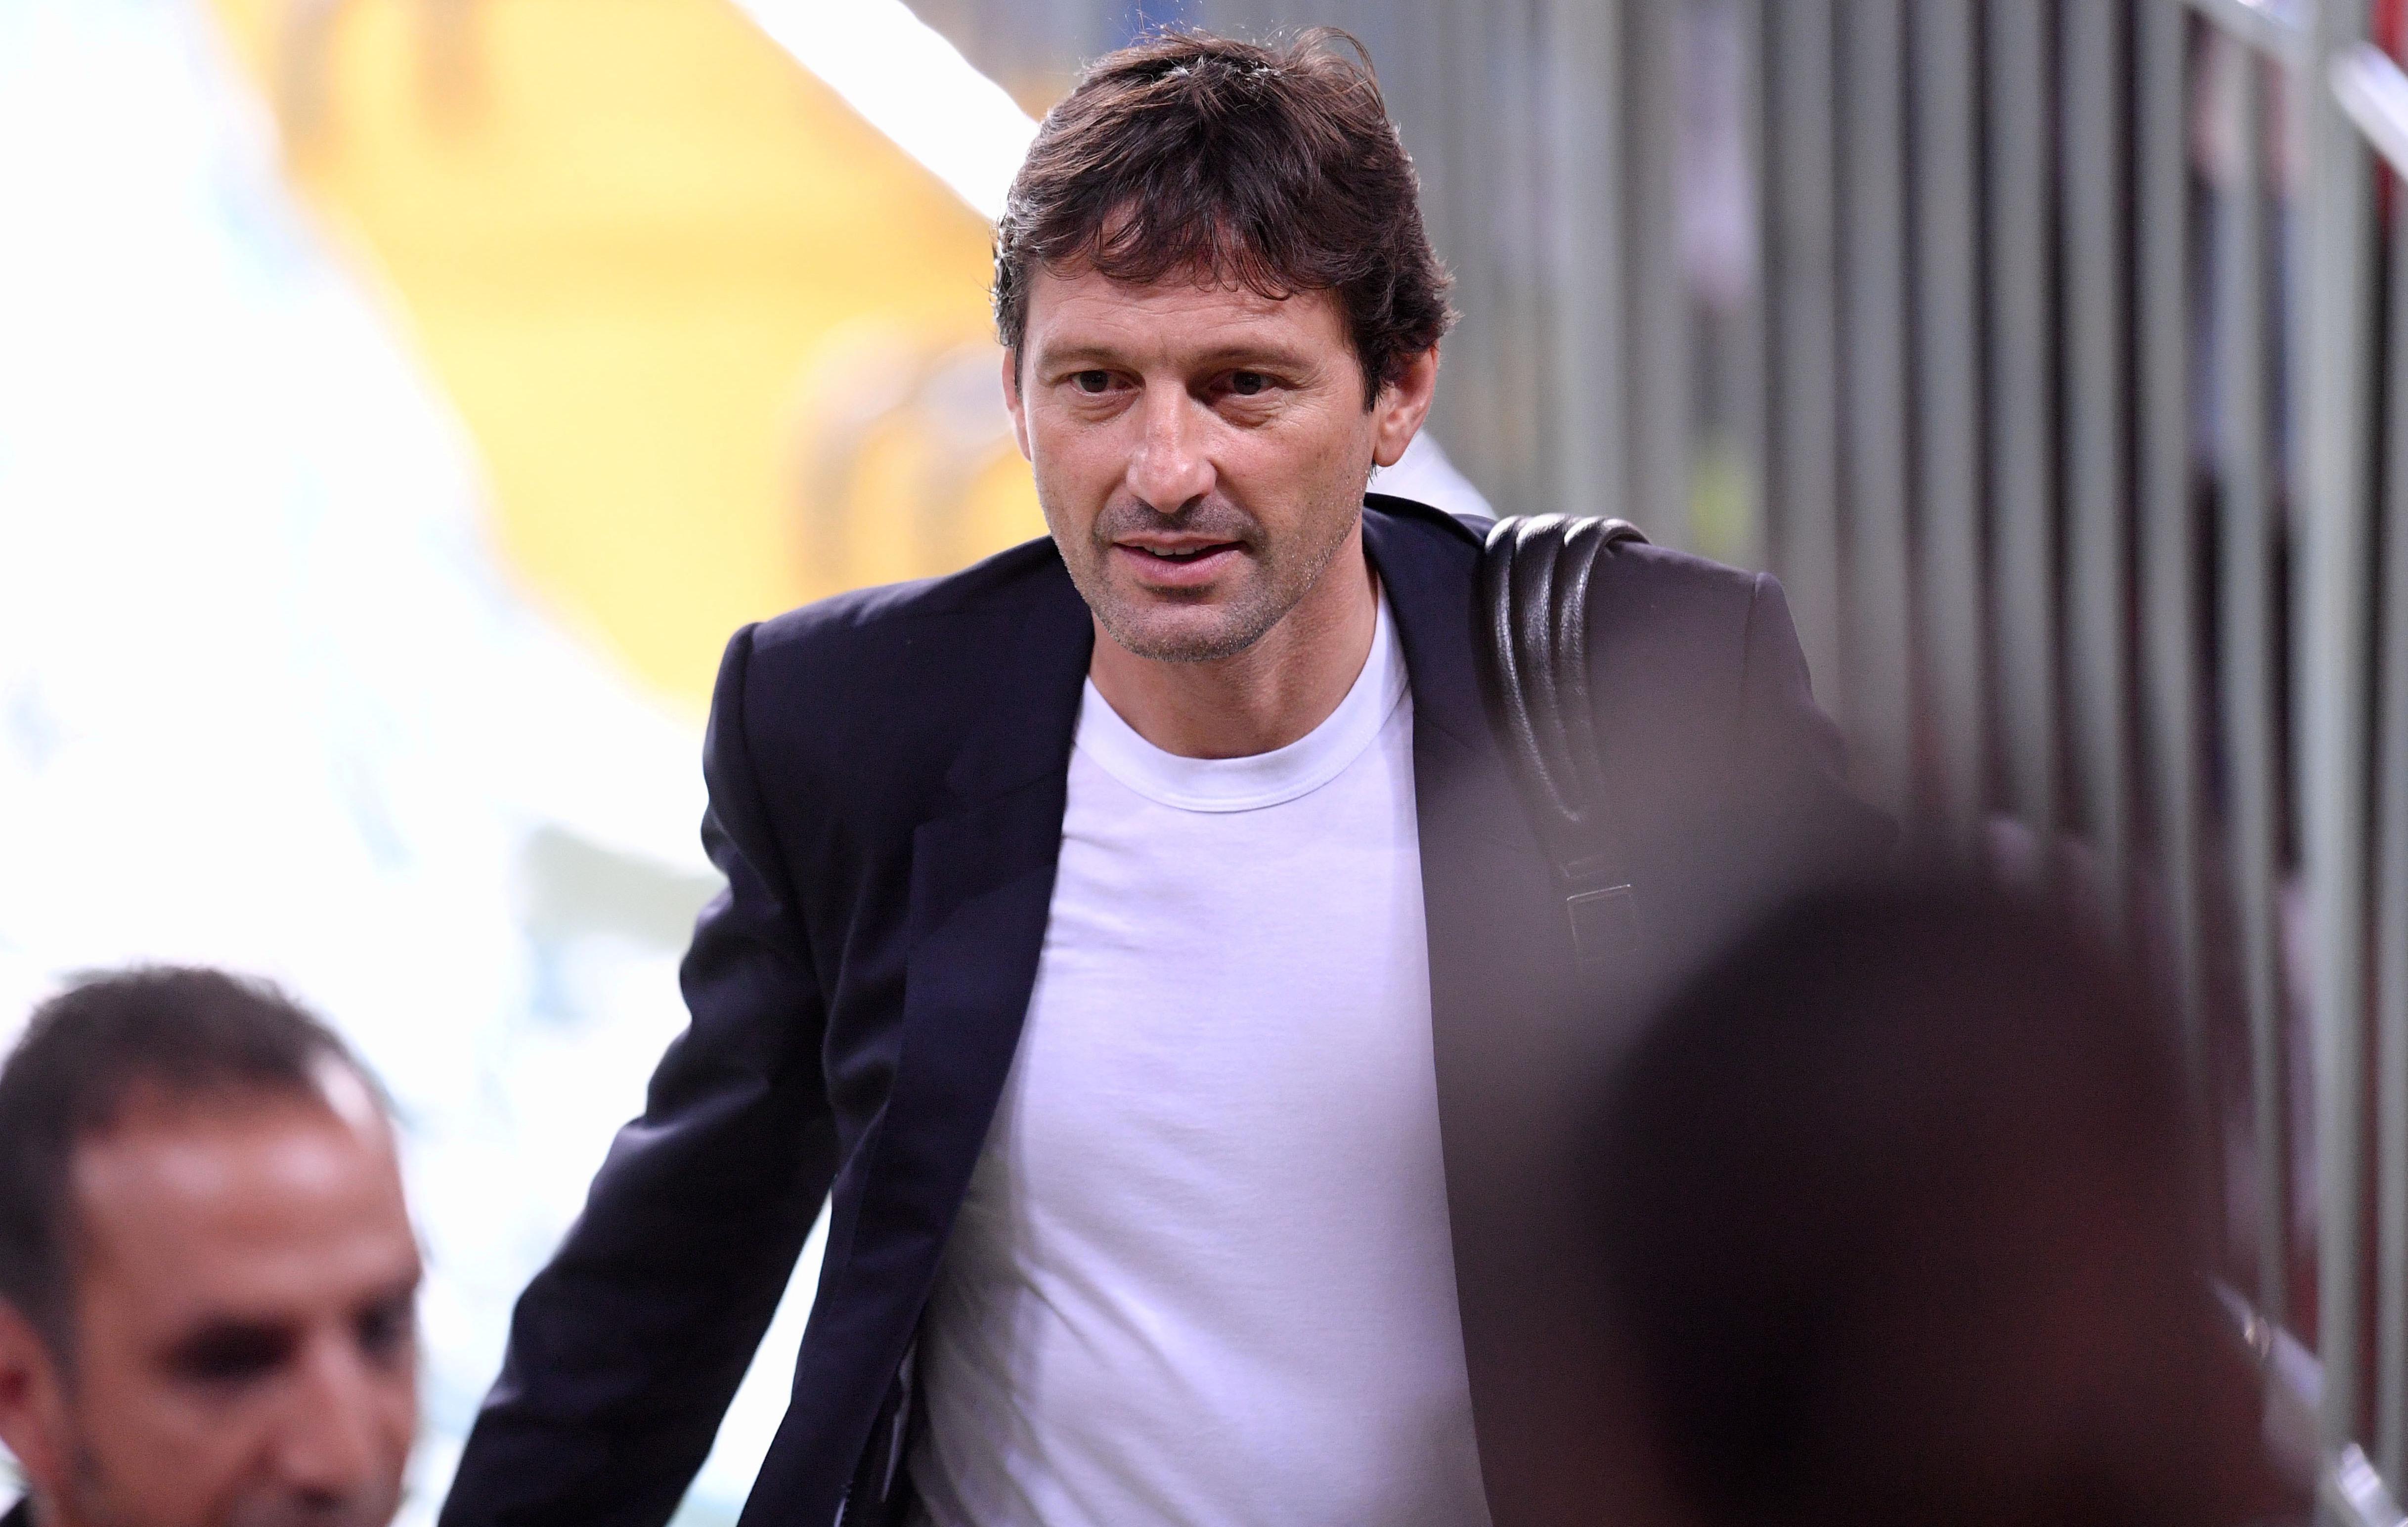 Football - Transferts - PSG : Leonardo reconnaît que «Neymar a commis des erreurs»